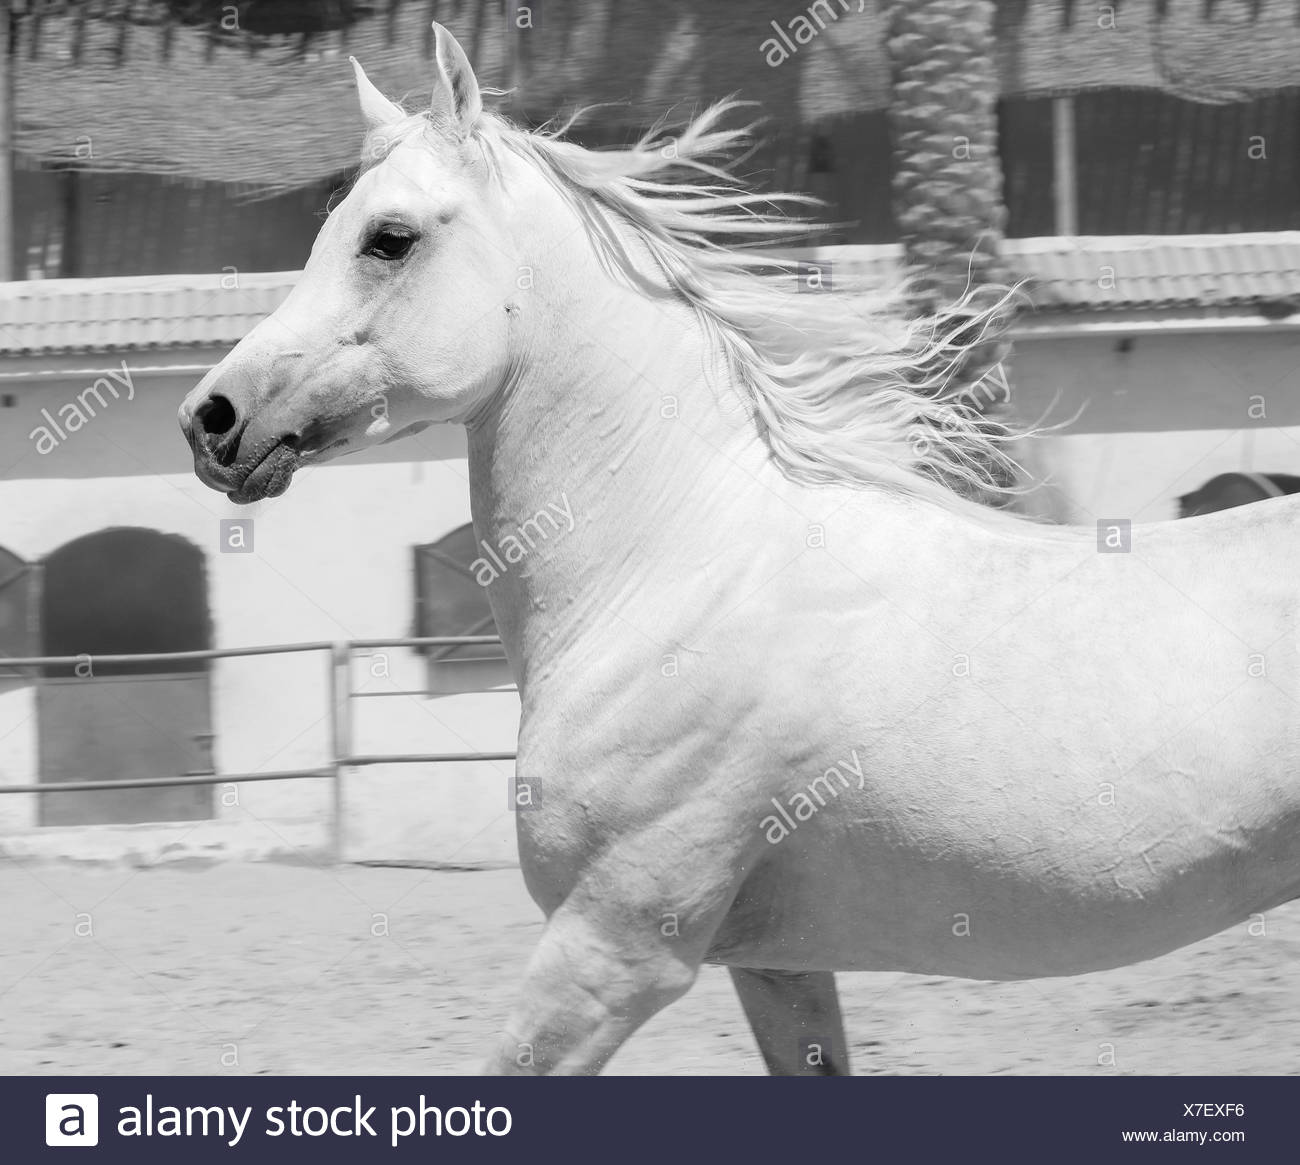 Arabian Horse in a sandy ranch/ featuring Arabian Horse in a sandy field in sunny day - Stock Image